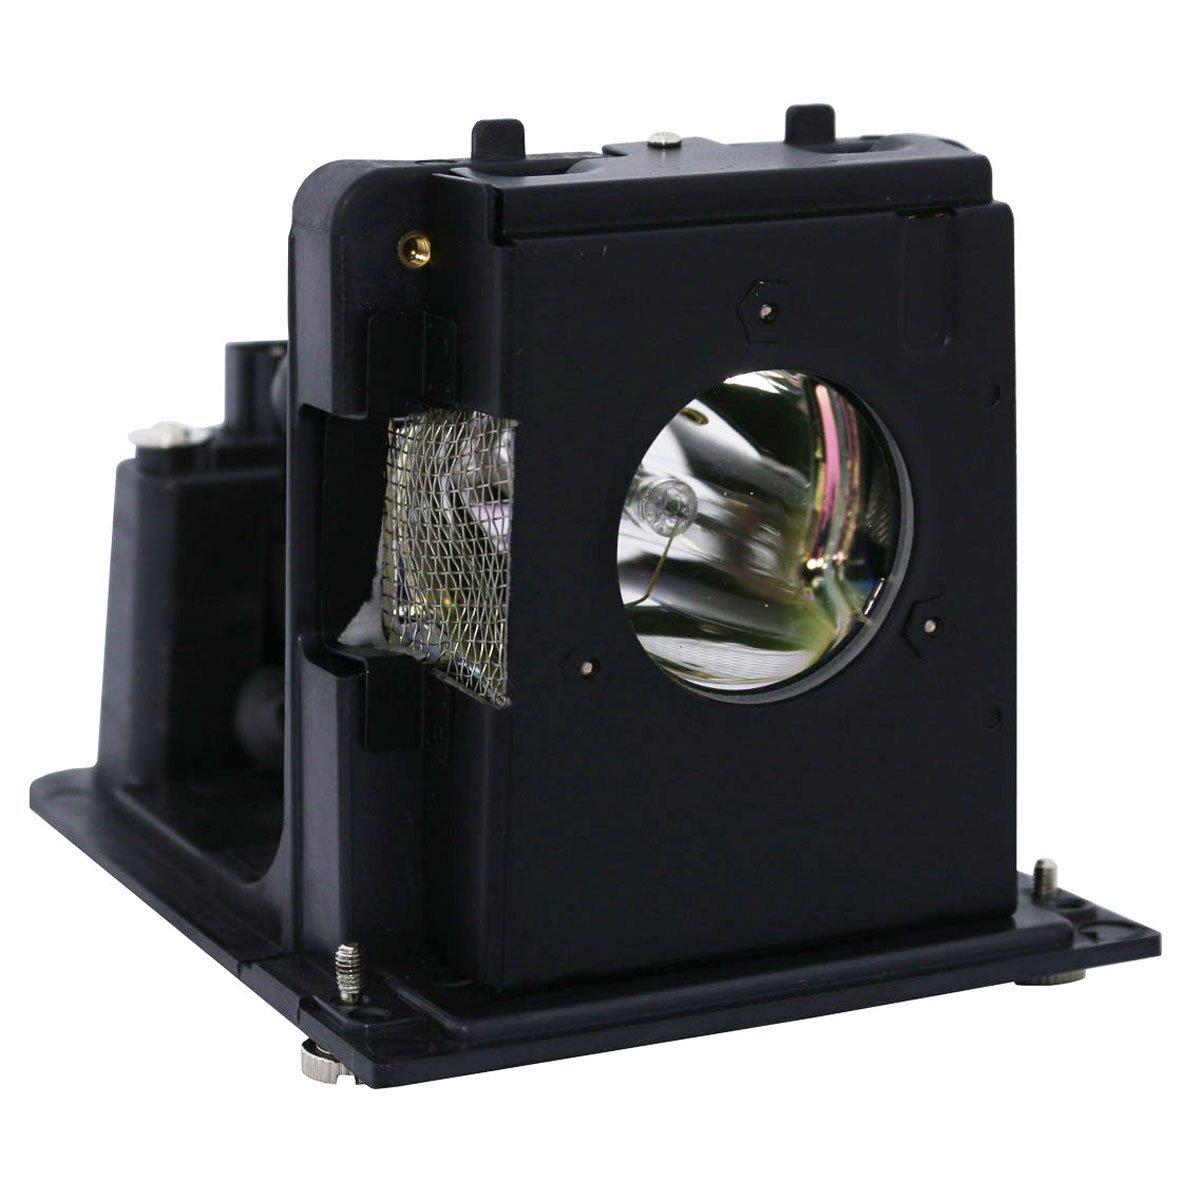 BL-FU250E SP.L3703.001 for OPTOMA H78 H78DC3 THEME-S H76 H77 H79 Projector Lamp Bulb with housing original projector lamp bl fu250e sp l1301 001 for optoma h77 h78 h78dc3 h79 h76